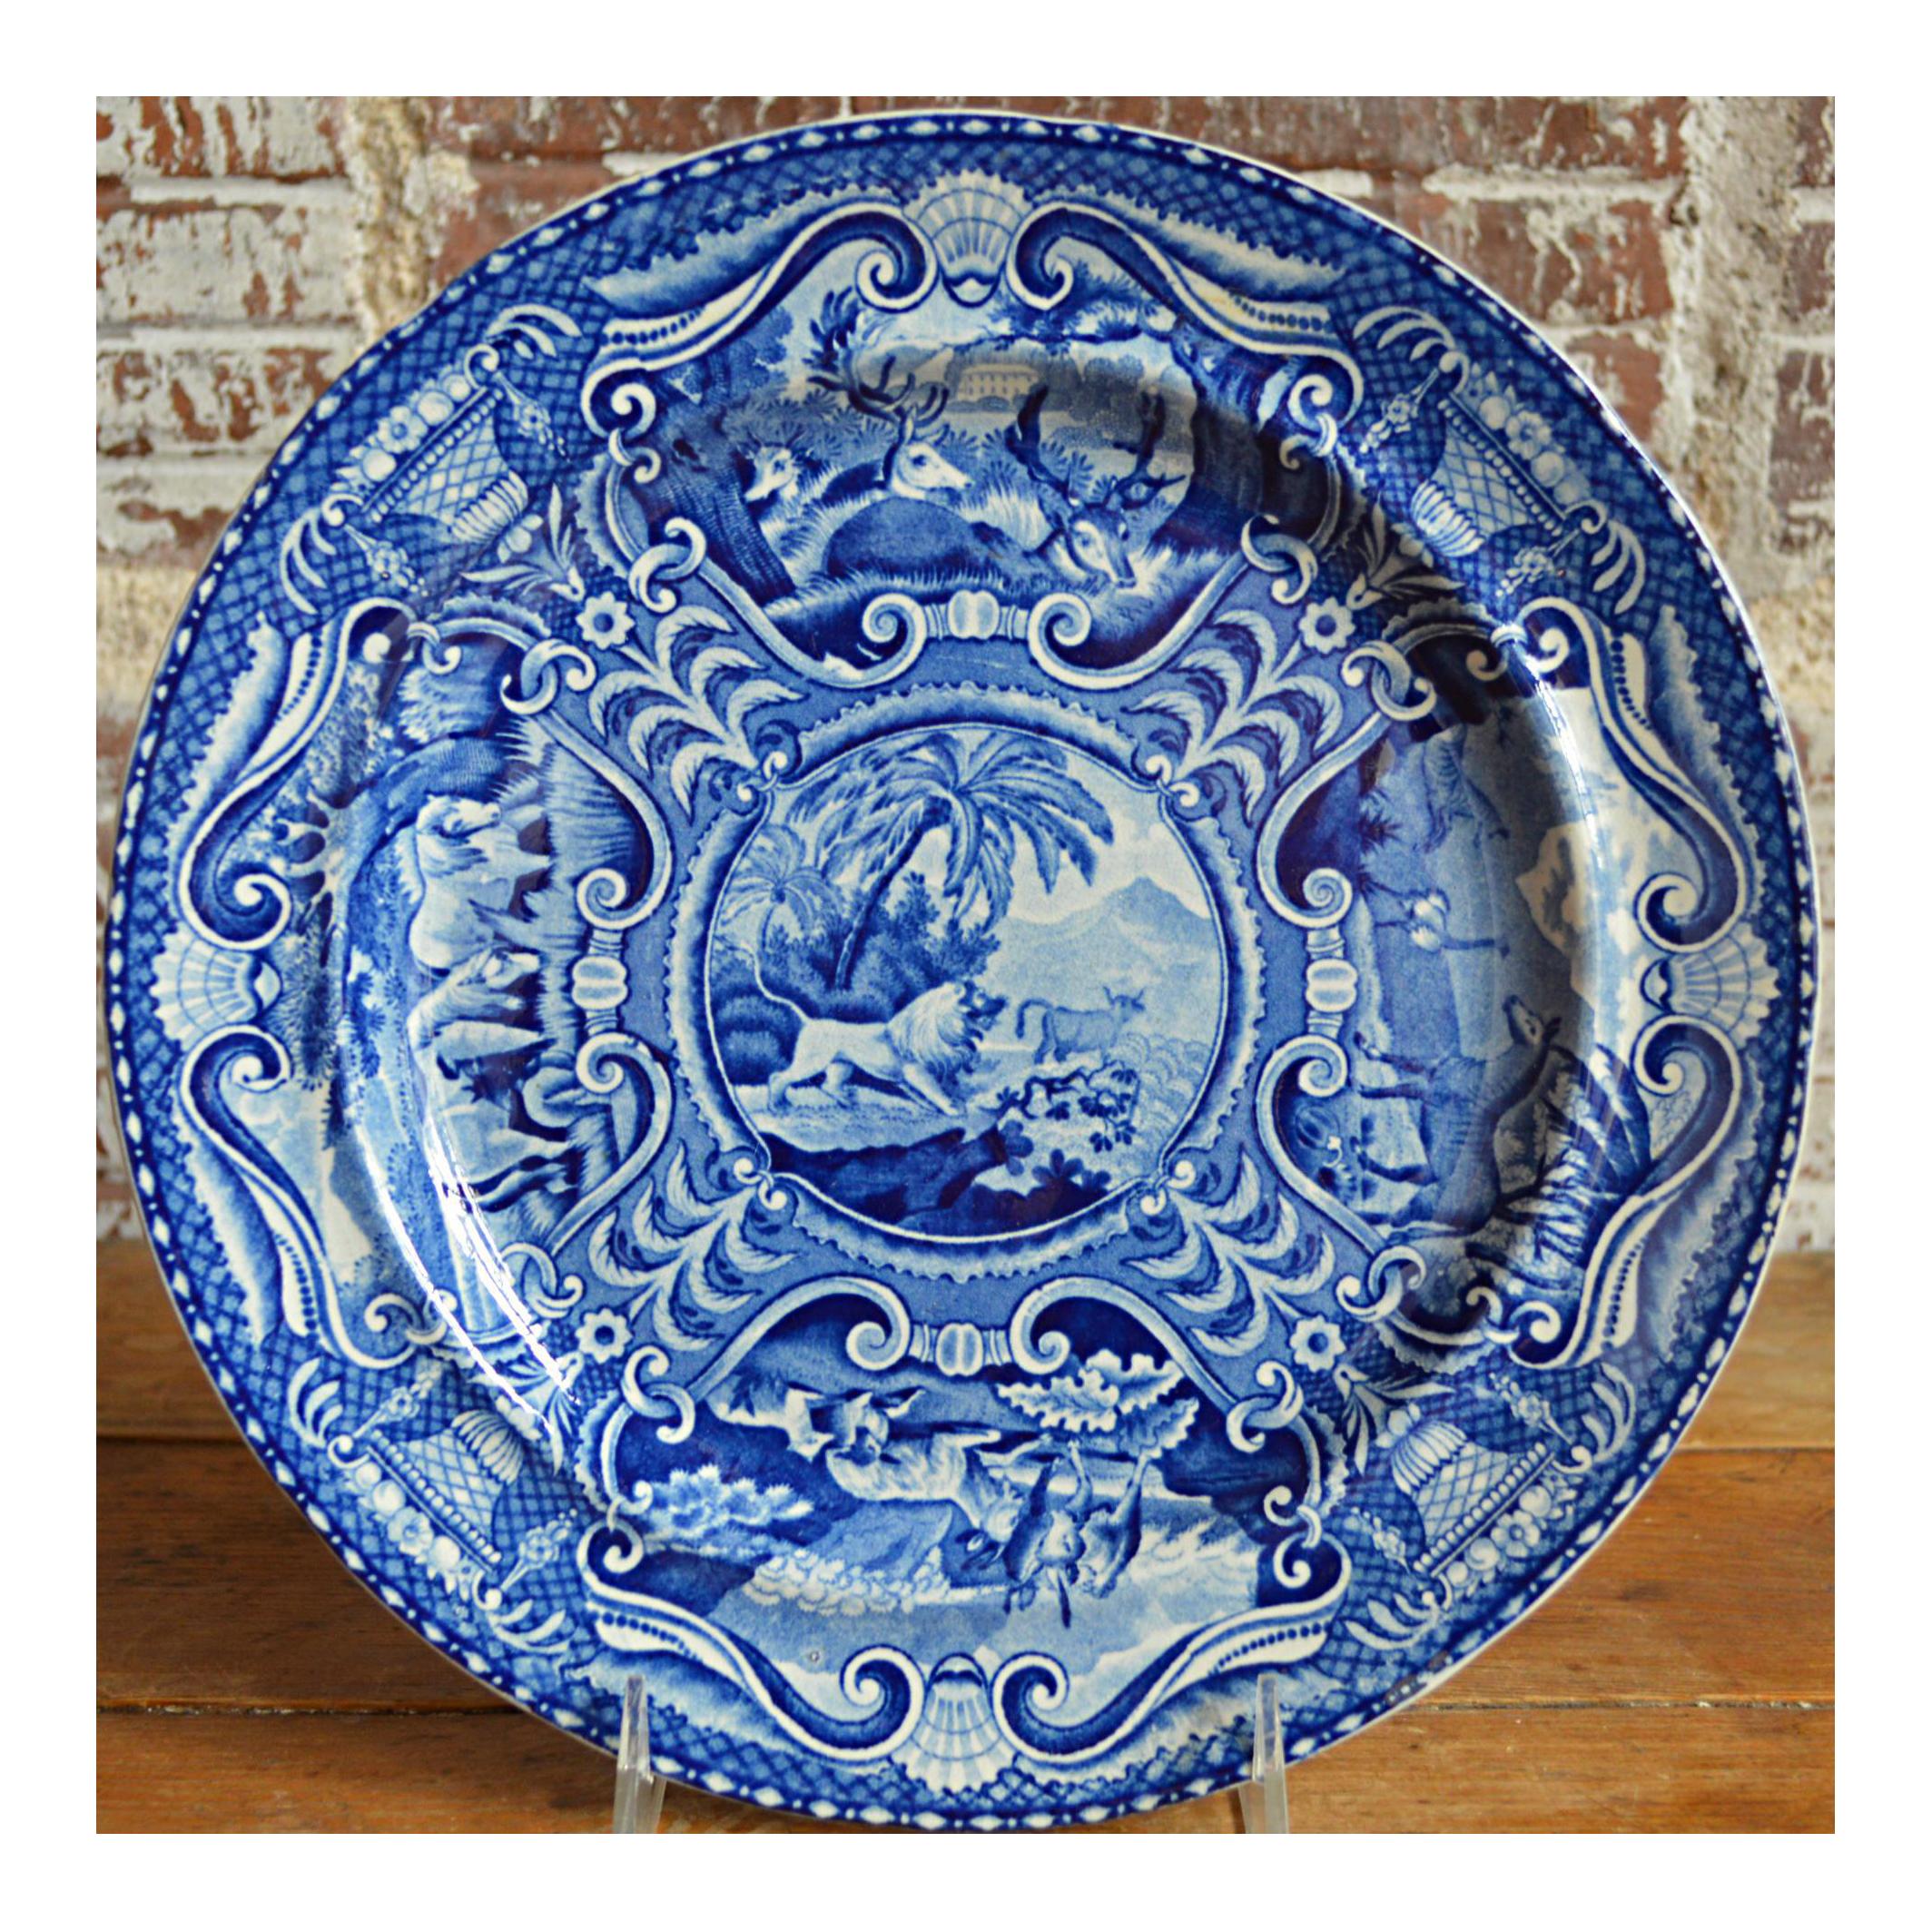 Quadrupeds Transferware Plate John Hall Staffordshire  sc 1 st  Chairish & Vintage \u0026 Used English Traditional Dinnerware | Chairish